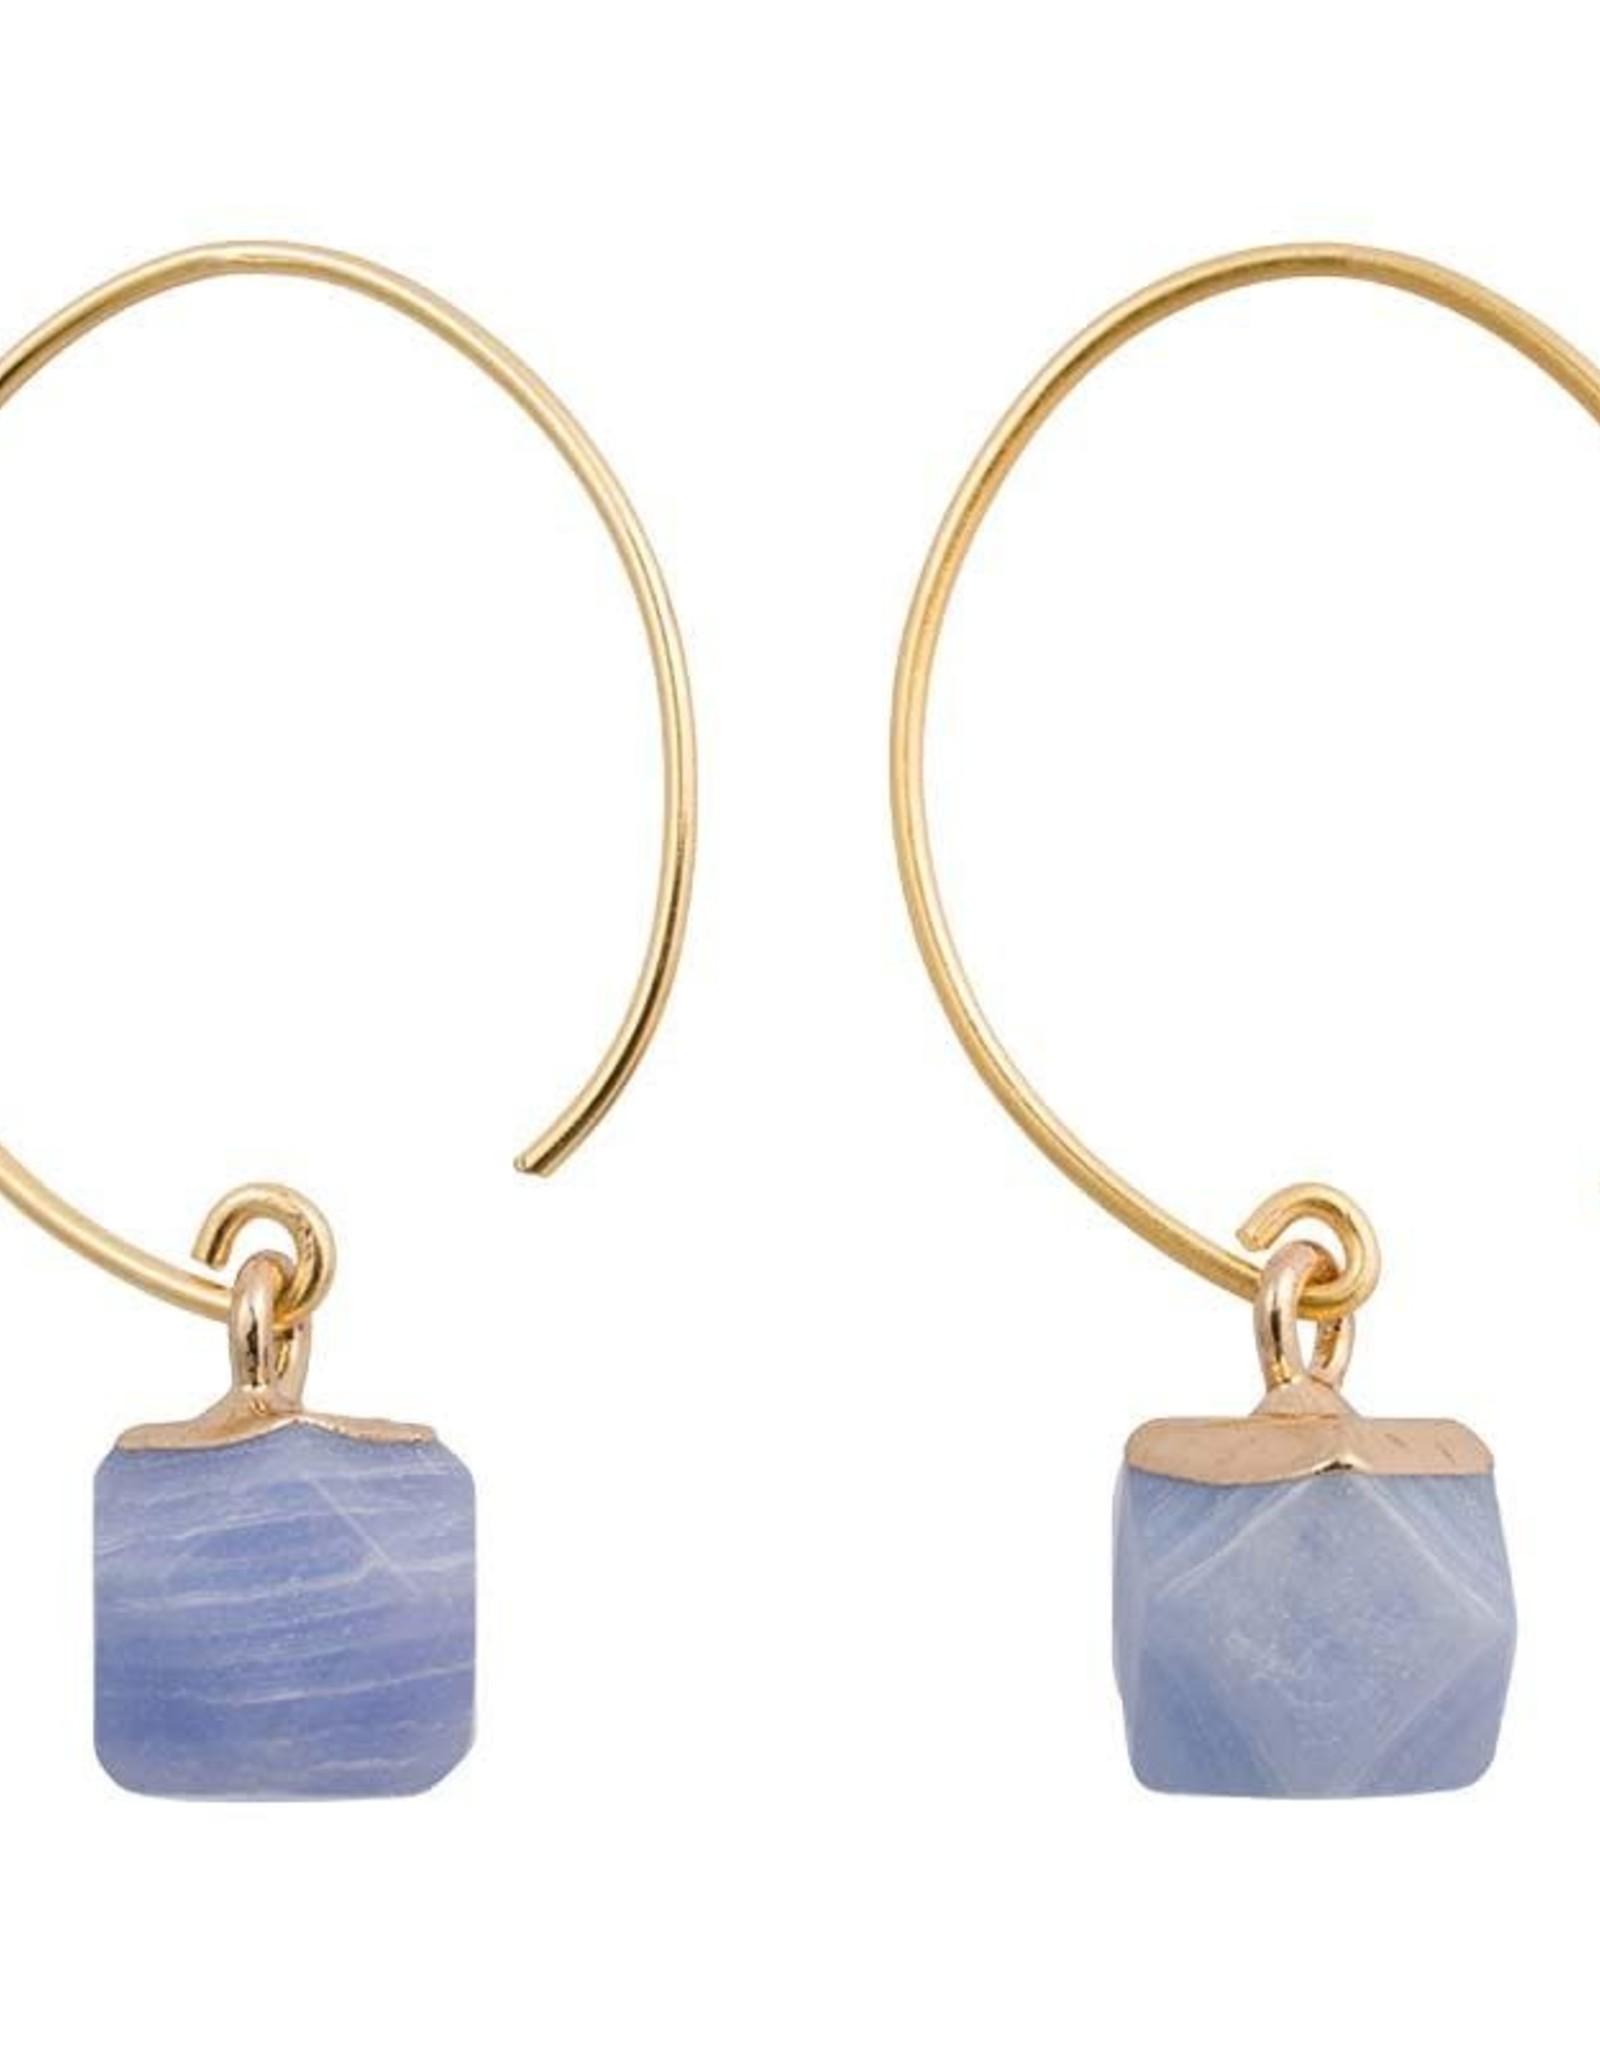 Clara Chic Brass and Stone Earrings, Chalcedony